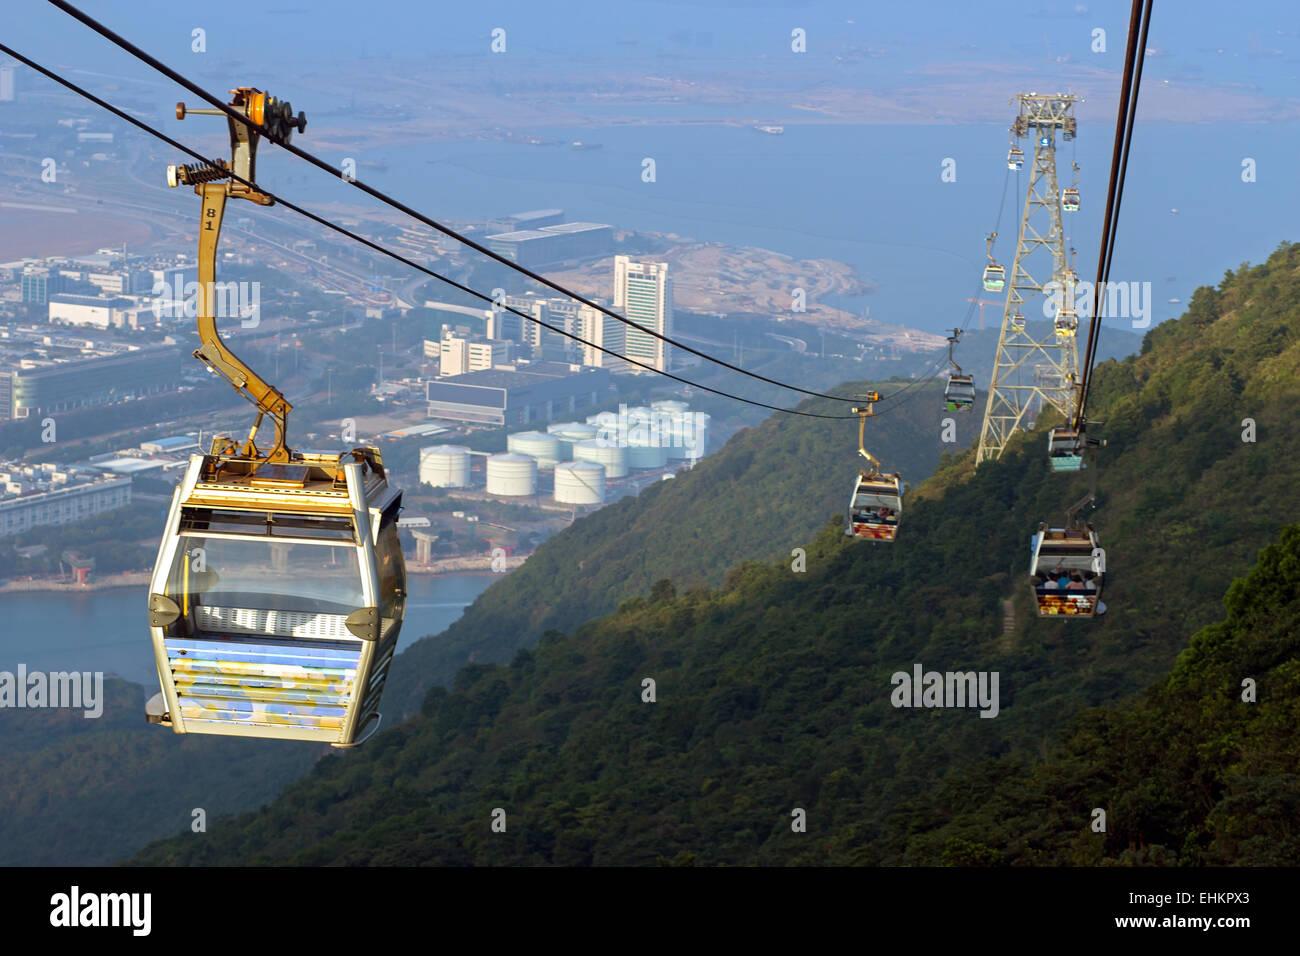 cableway over The Lantau Island - Stock Image